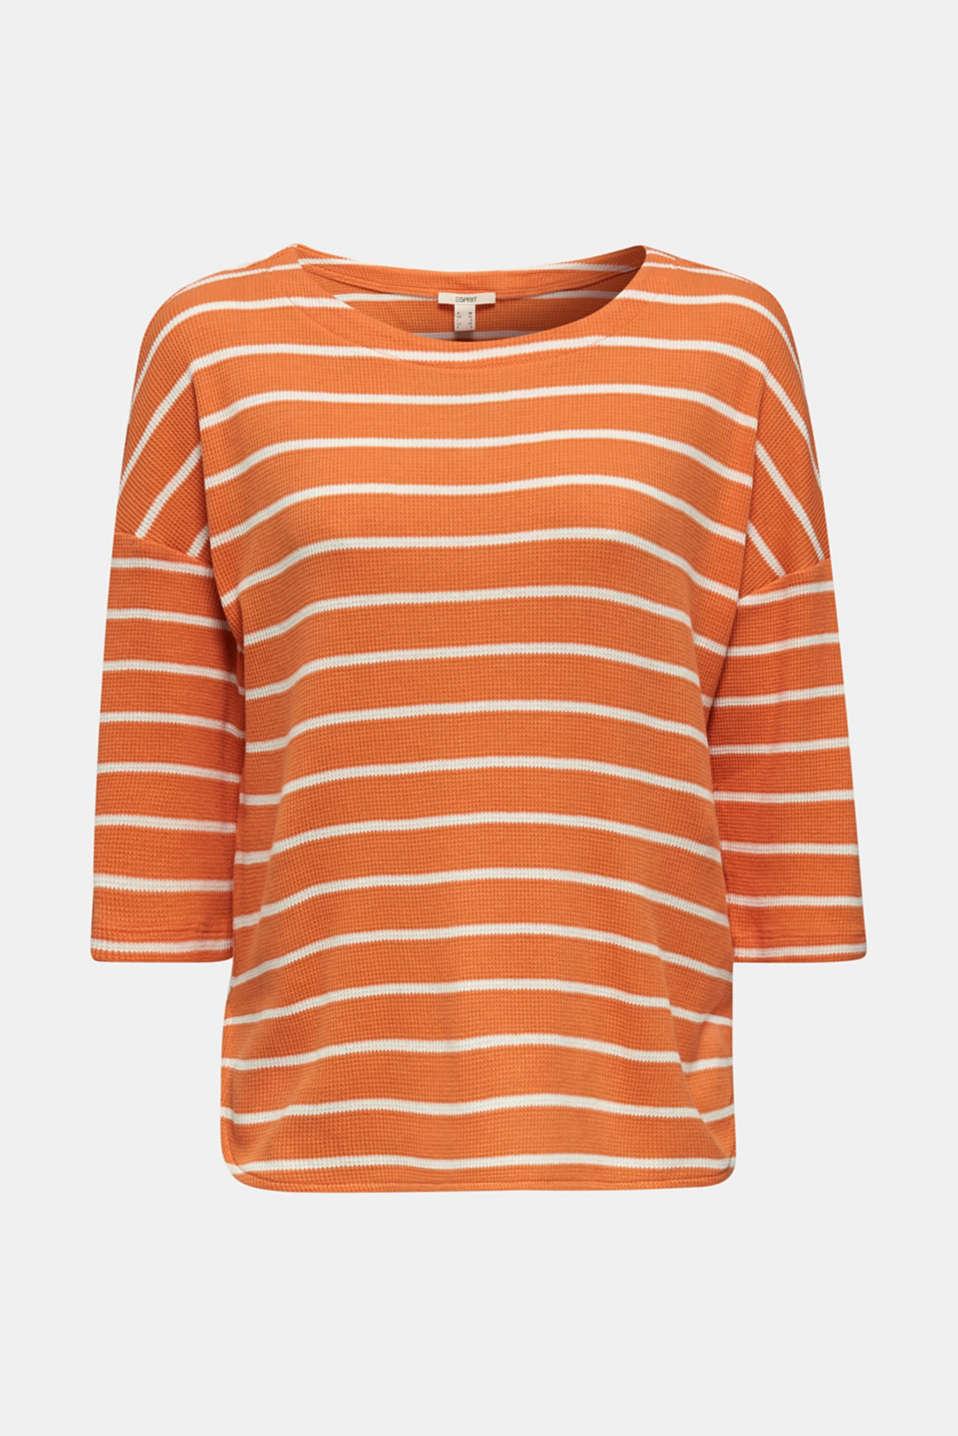 Piqué T-shirt in 100% cotton, RUST ORANGE, detail image number 8